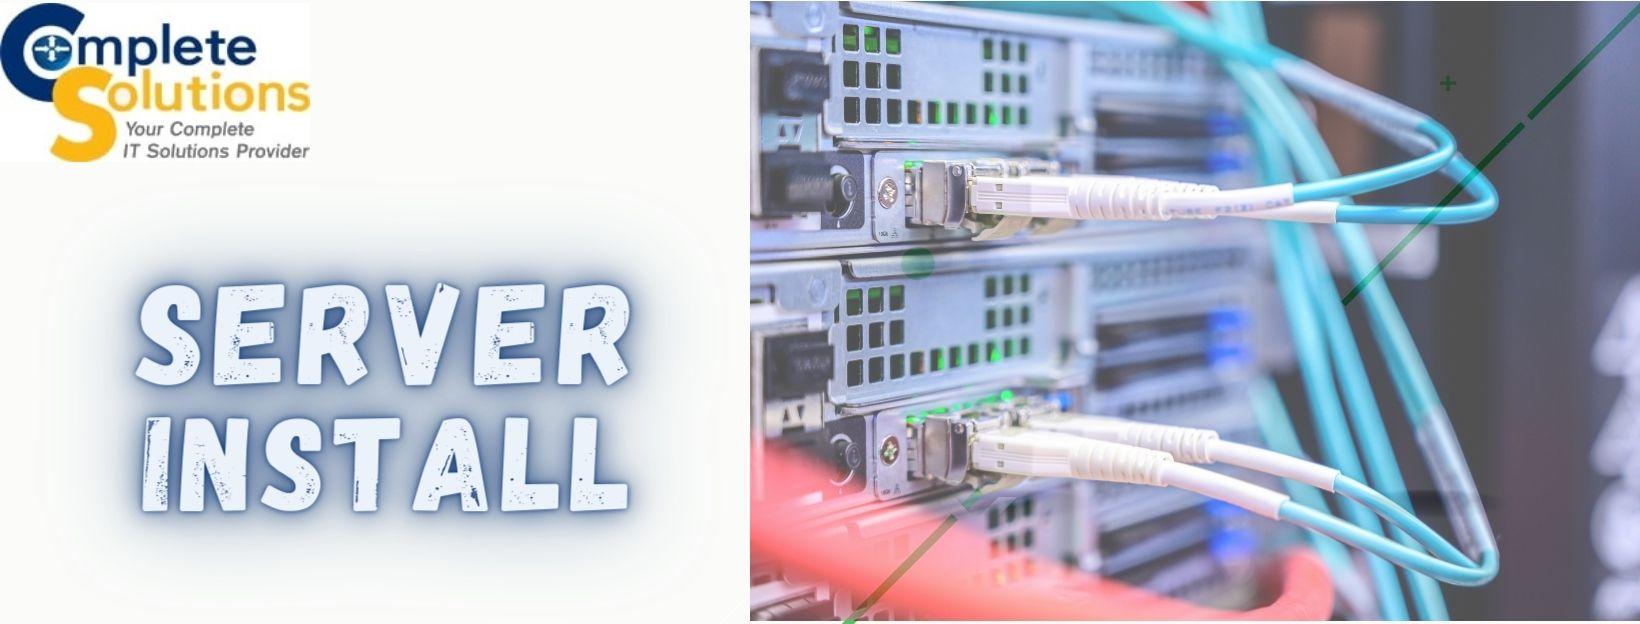 Server Installation in Piscataway NJ